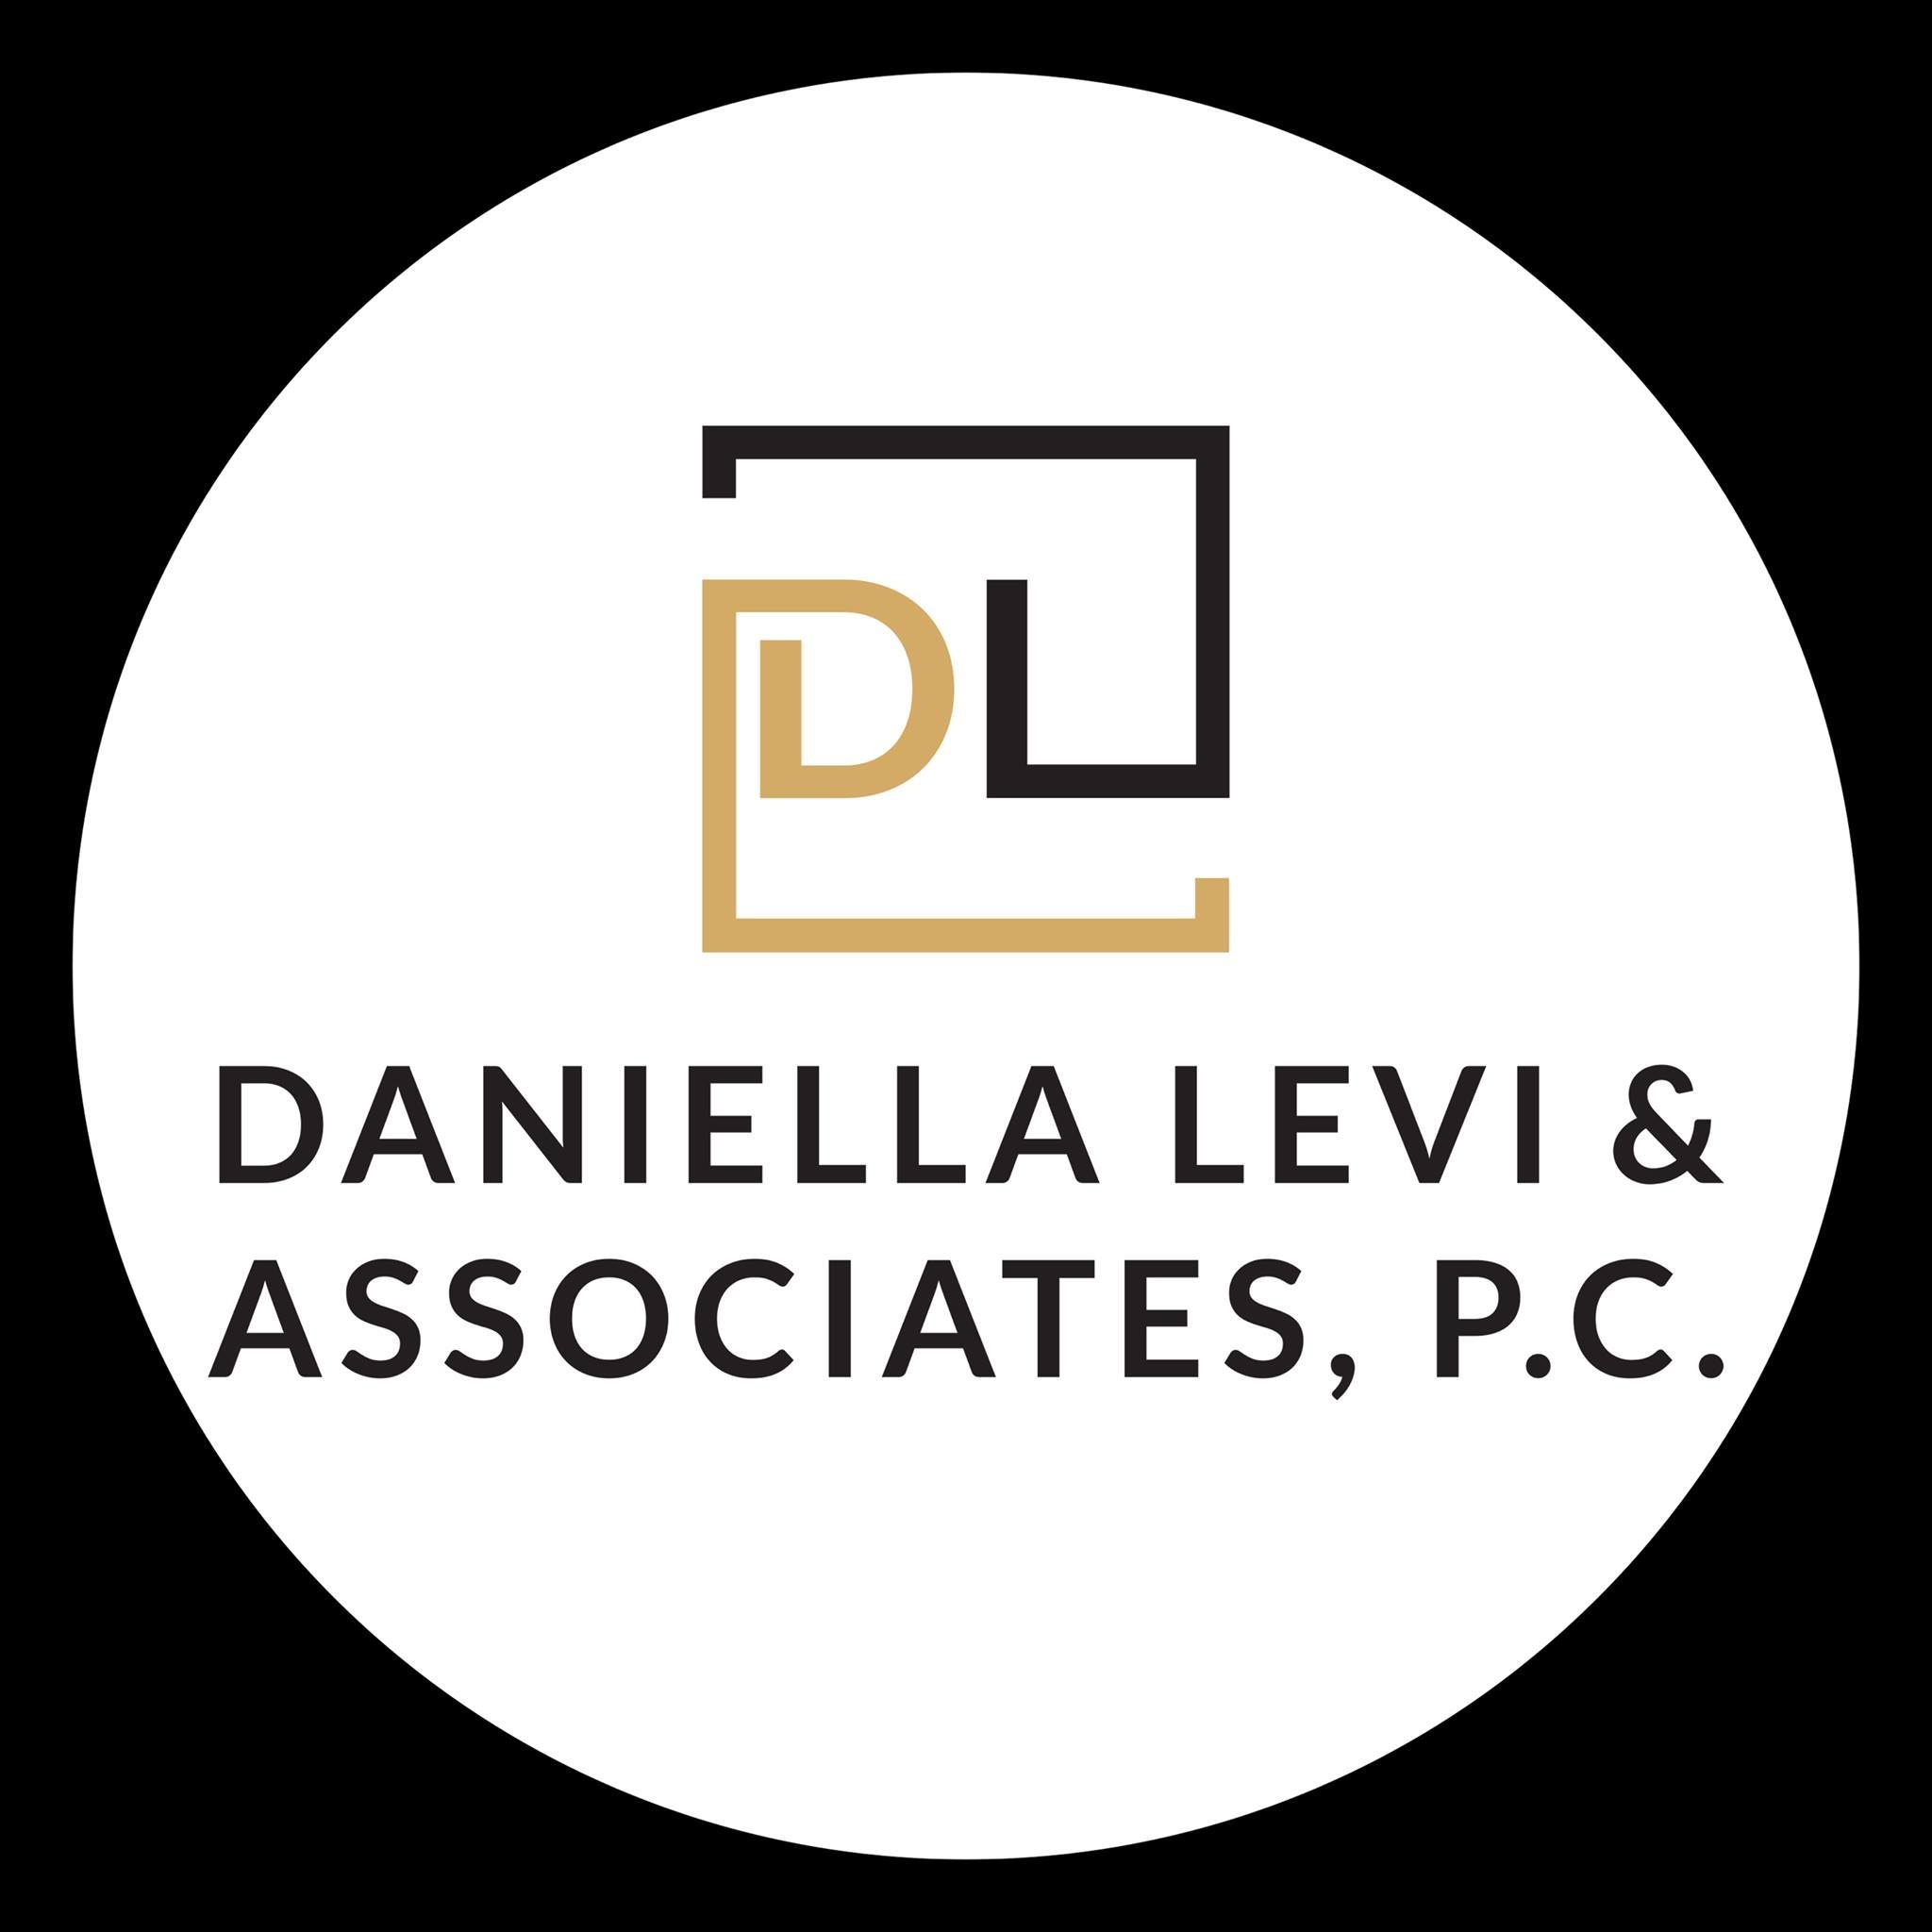 Daniella Levi & Associates P.C.